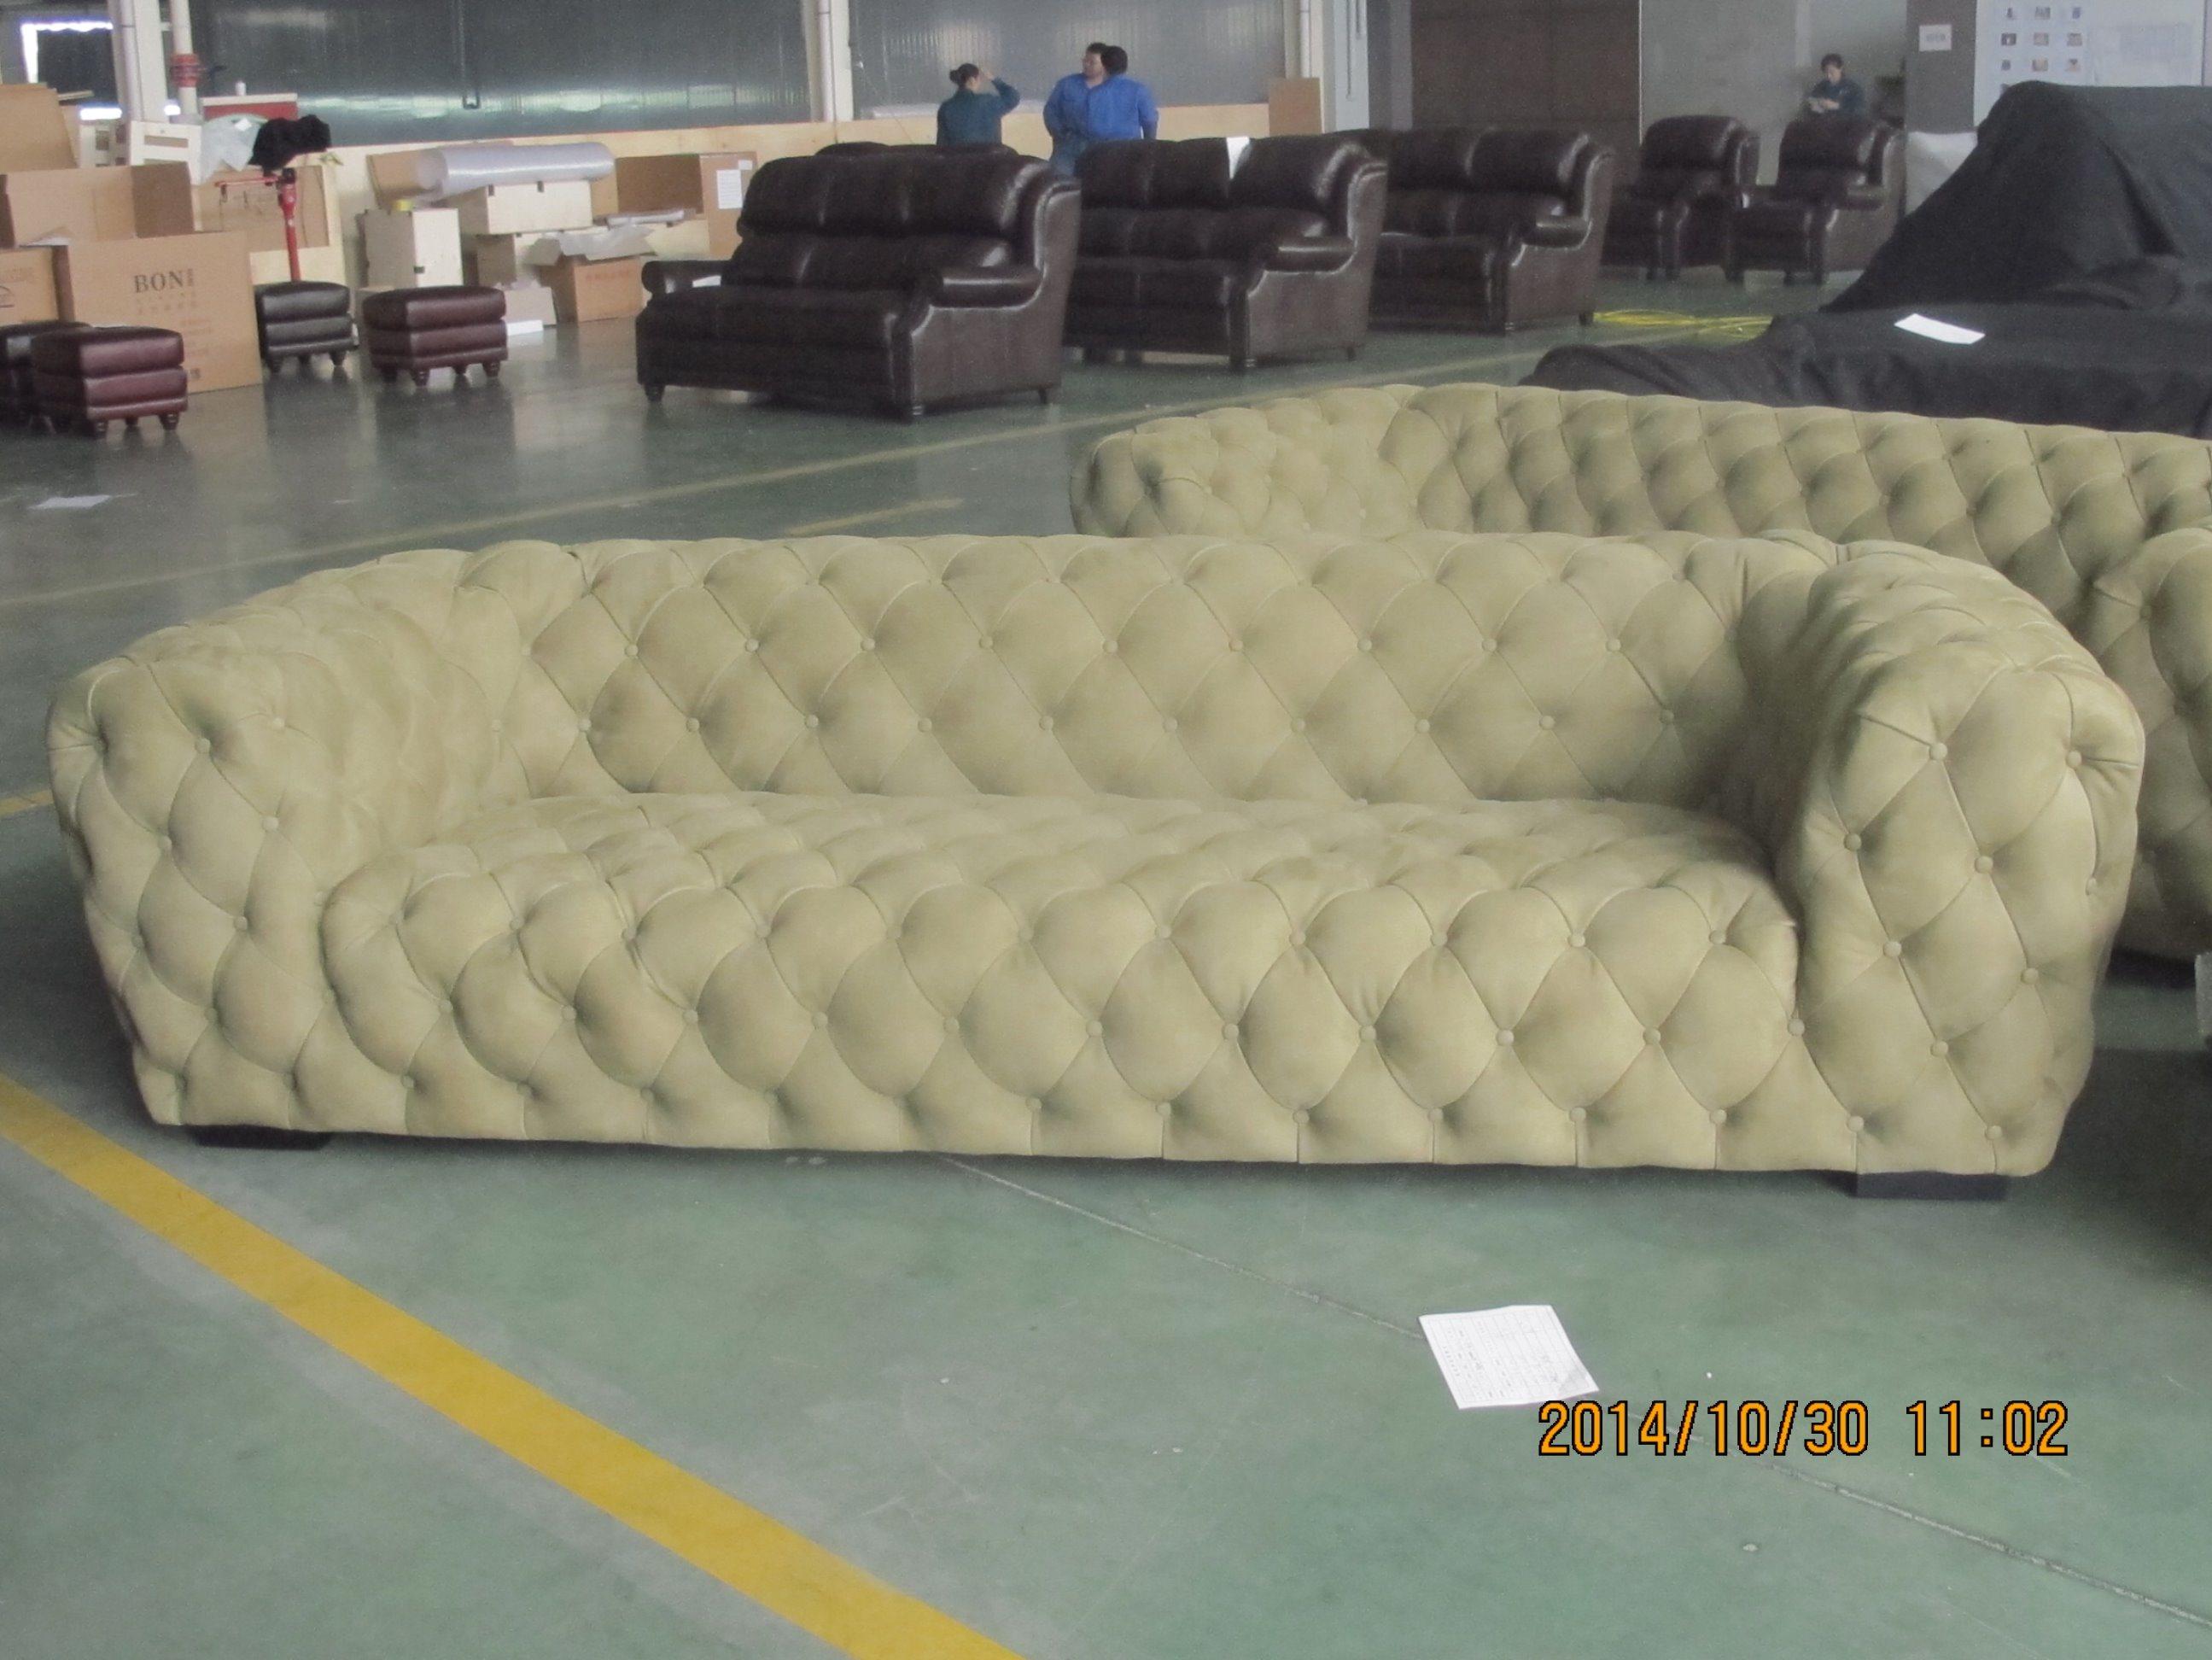 Luxurious Italian Leather Living Room Furniture: China Luxury Living Room Furniture Italian Style Sofa Bed